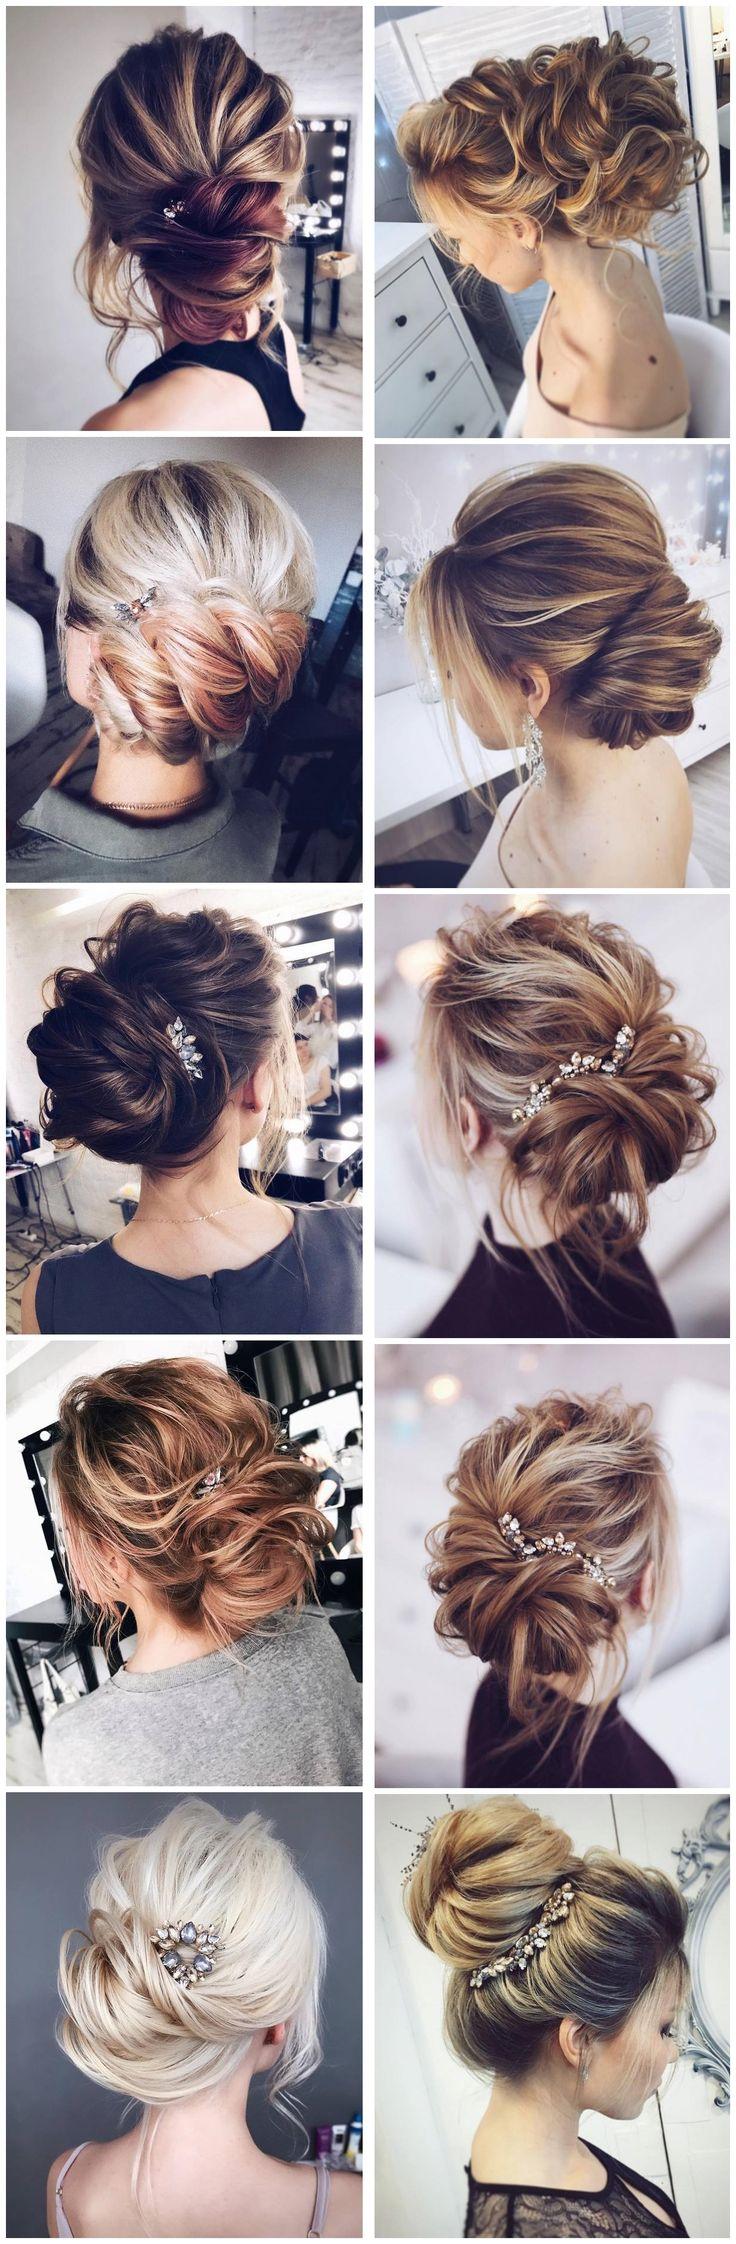 Tonyastylist Wedding Updo Hairstyles for Bride #weddings #updos #wedidngideas #w...